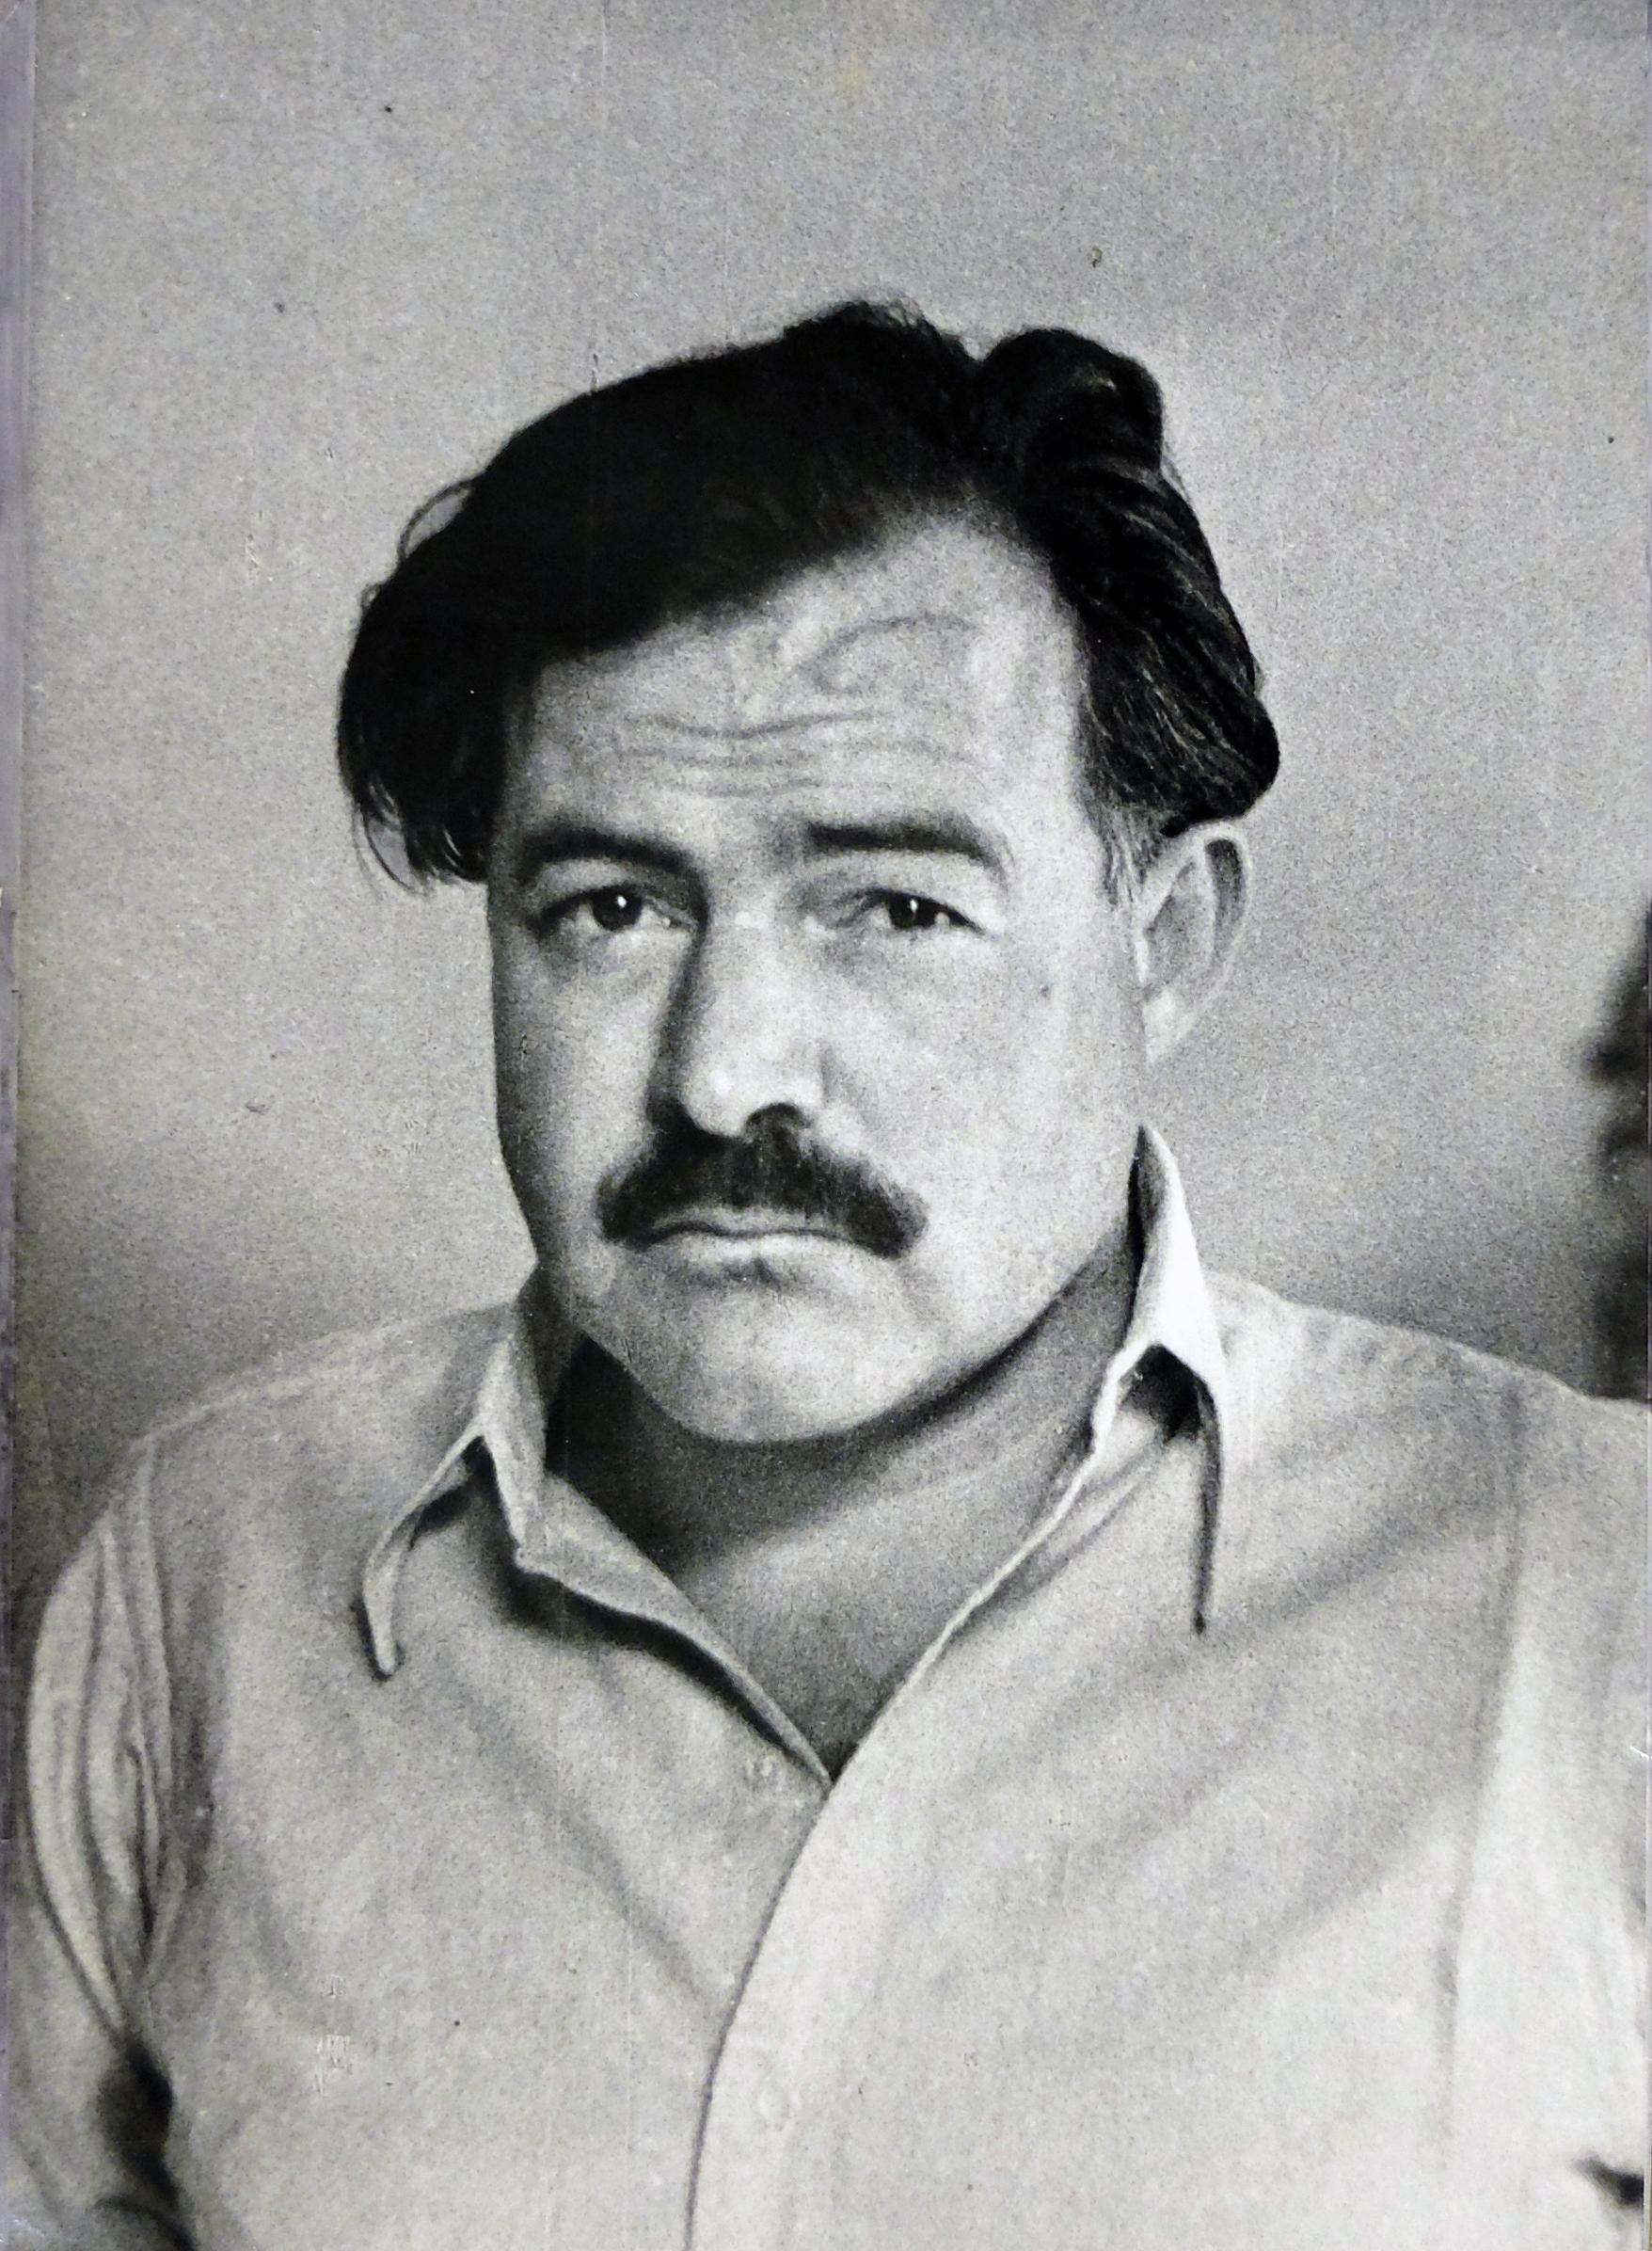 Hemingway at Princeton | RBSC Manuscripts Division News